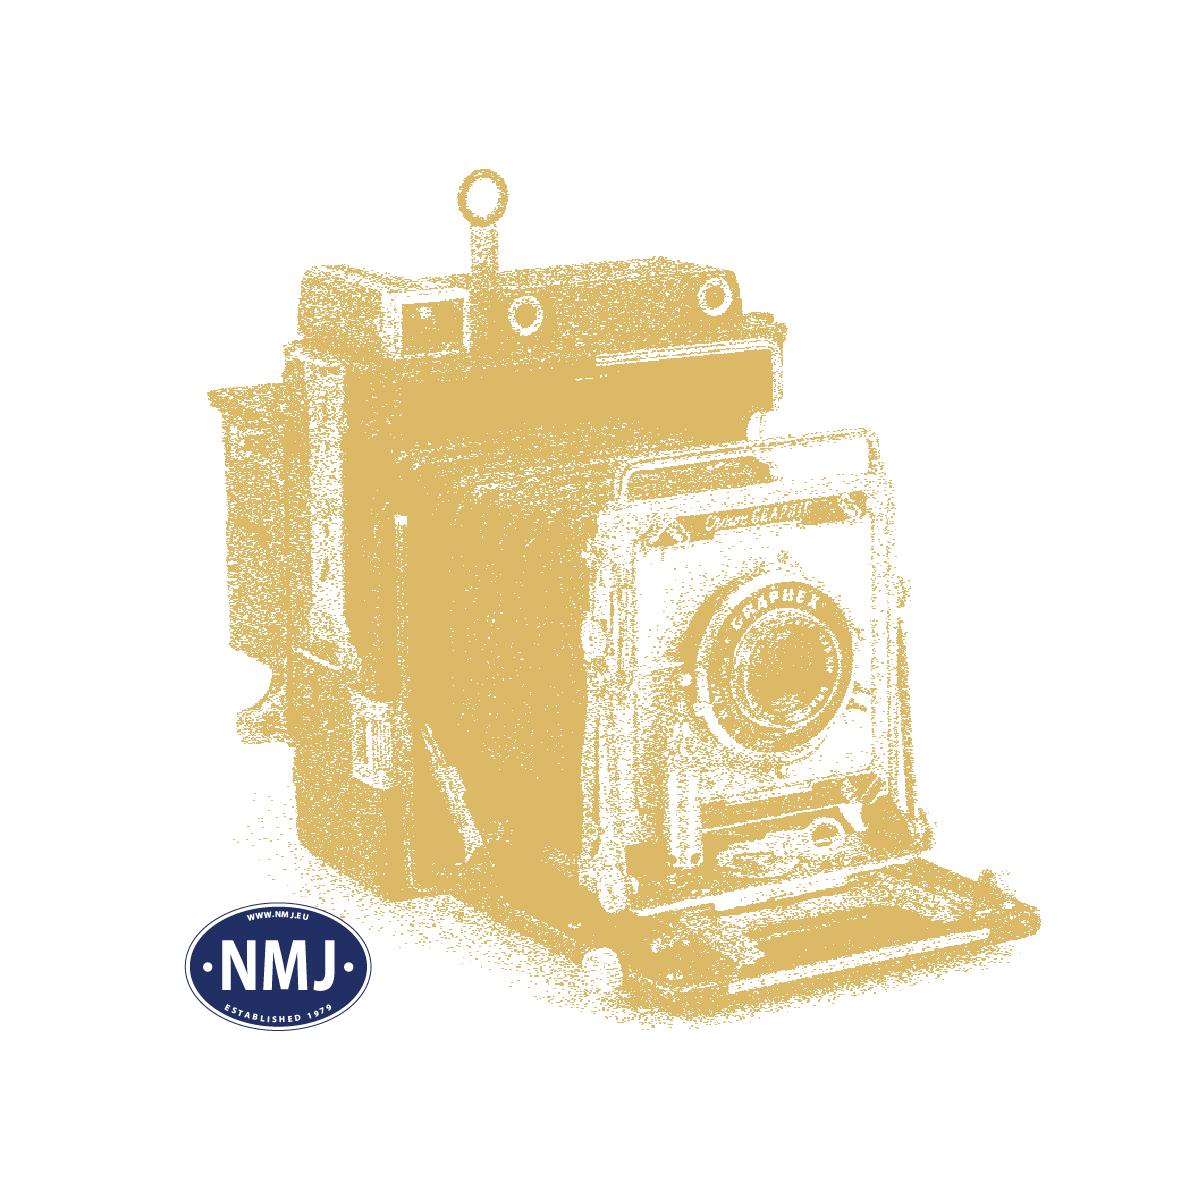 MRHPS-388 - Drain & Dust Catcher II Light